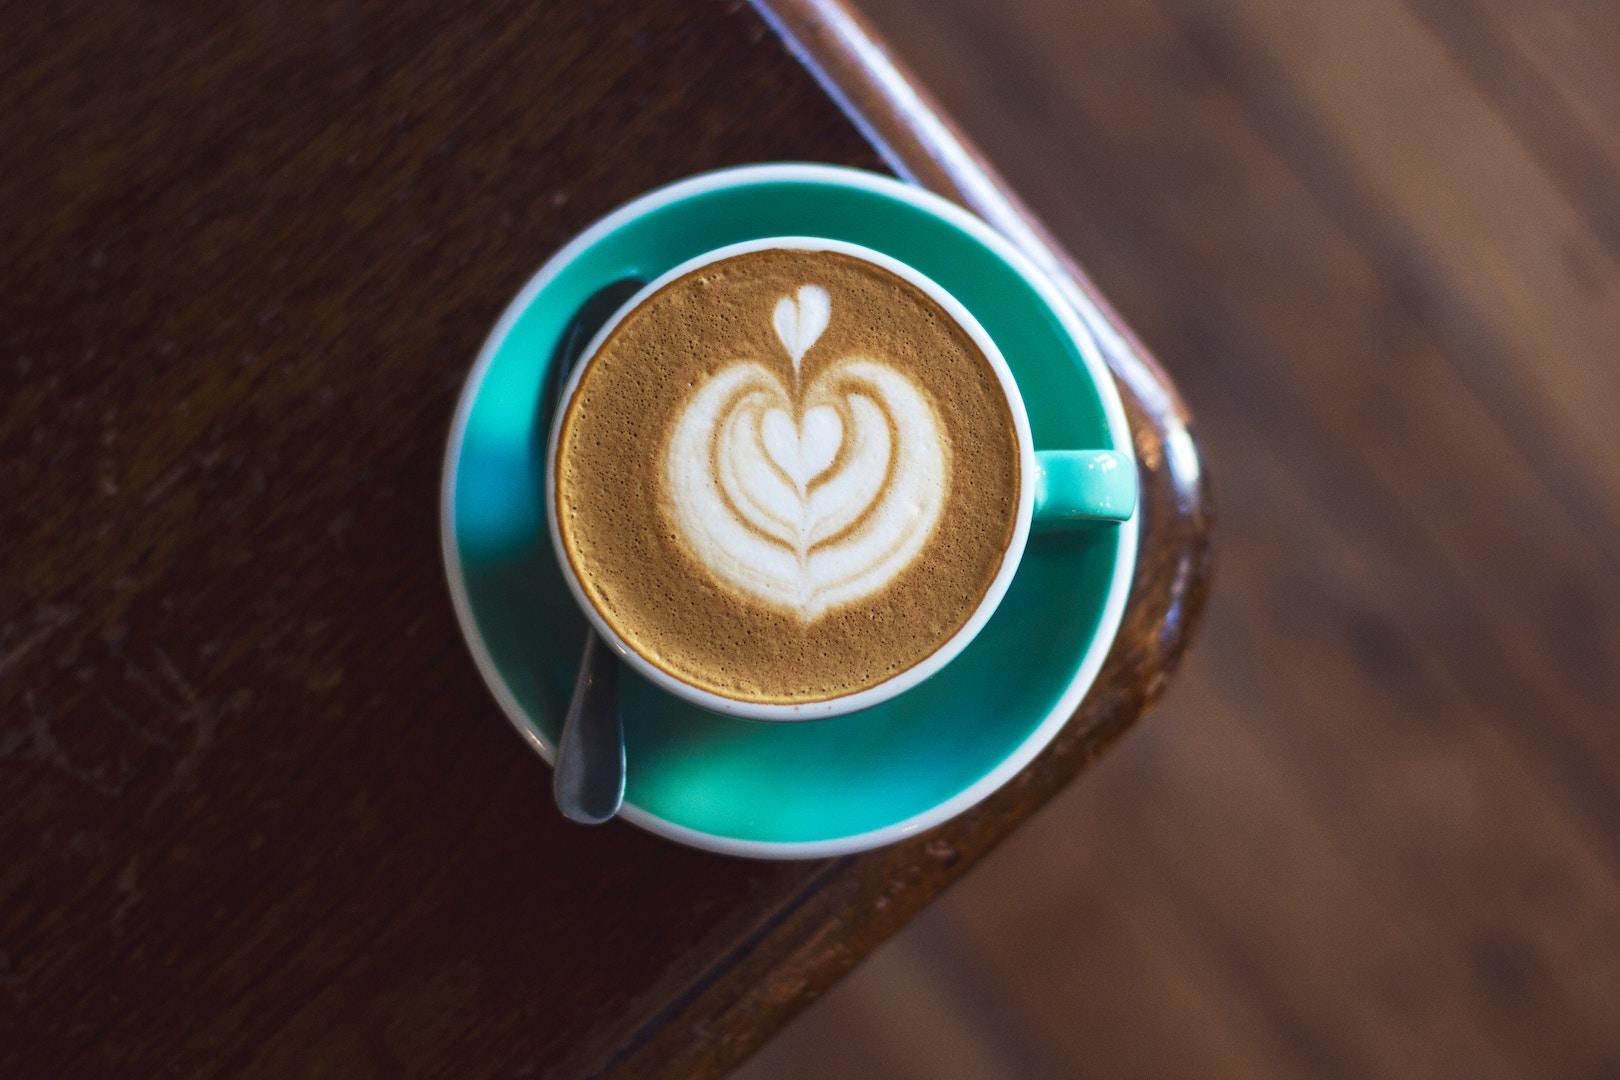 Rome caffè